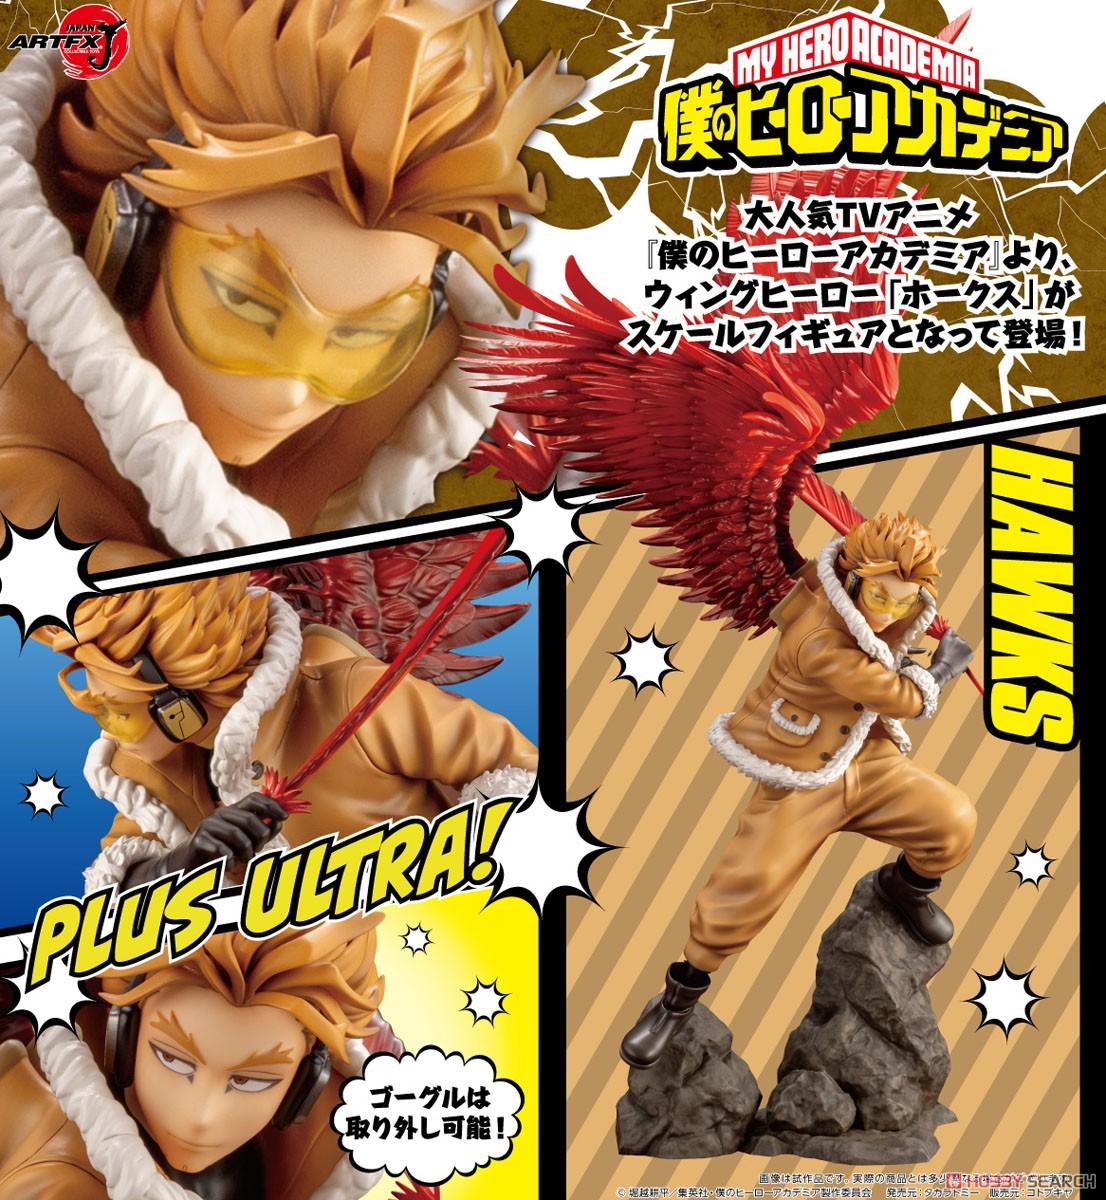 ARTFX J『ホークス』僕のヒーローアカデミア 1/8 完成品フィギュア-009